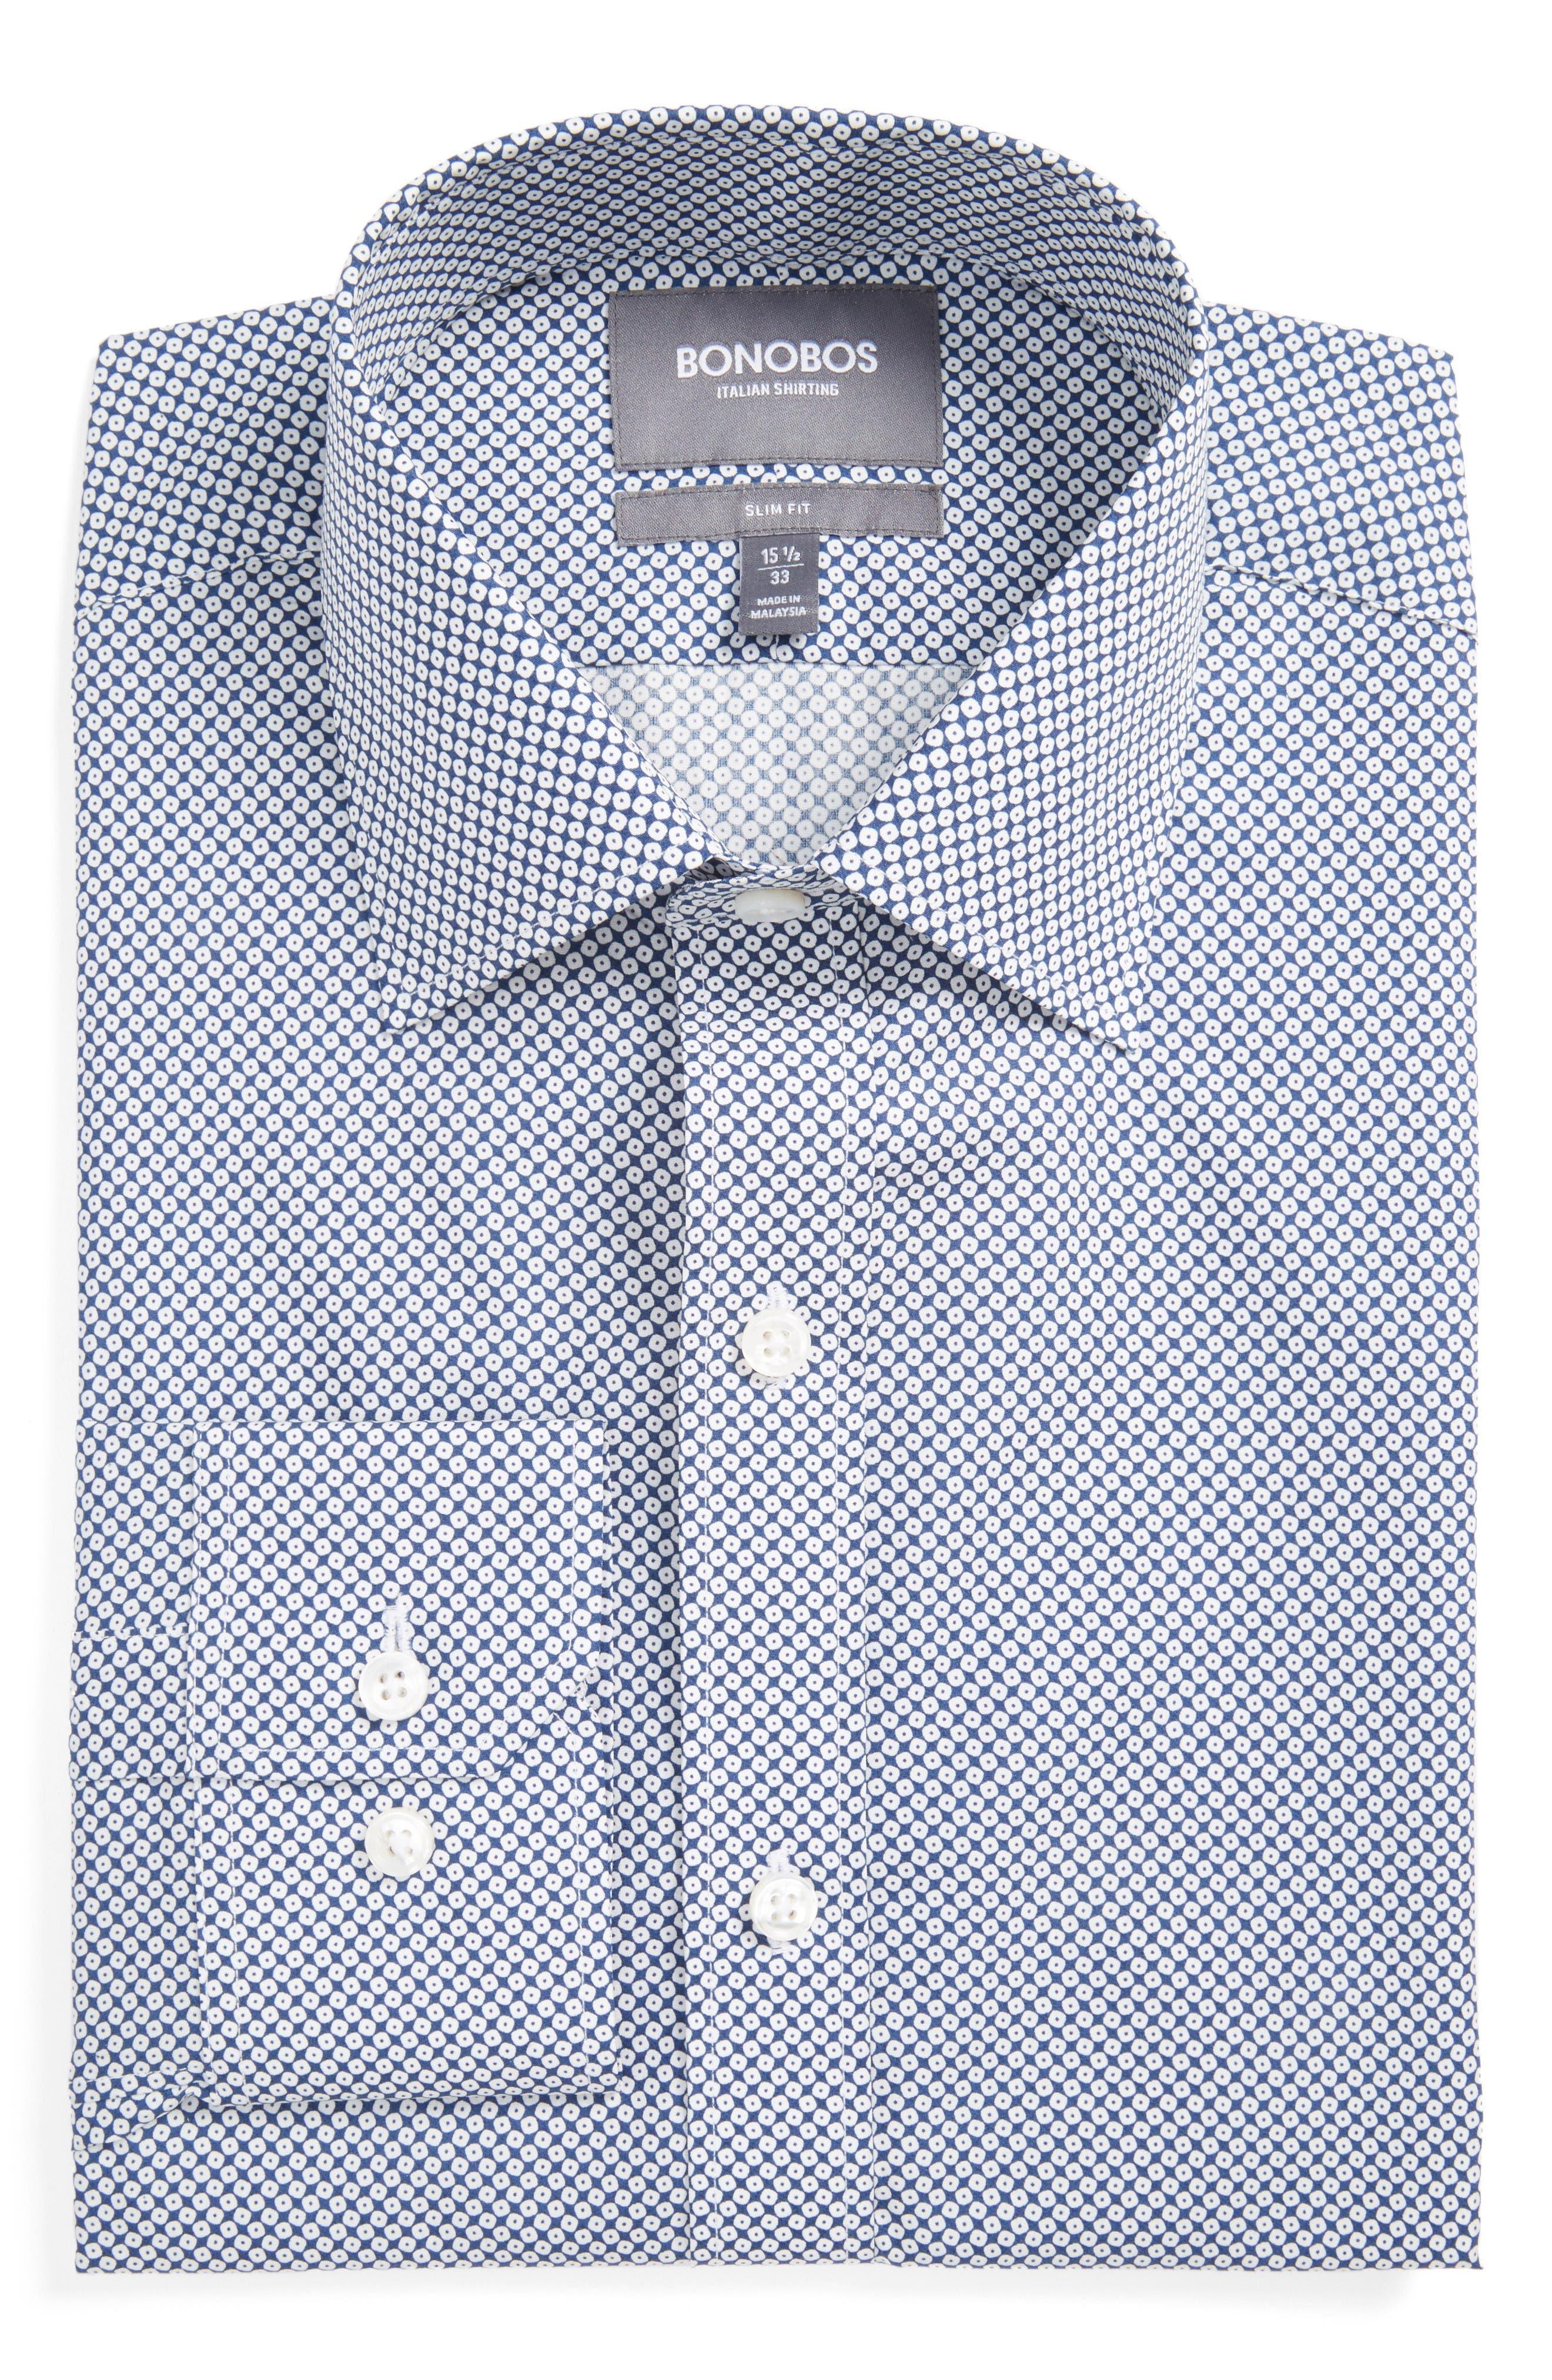 Americano Slim Fit Geometric Dress Shirt,                         Main,                         color, Navy Vista Geo